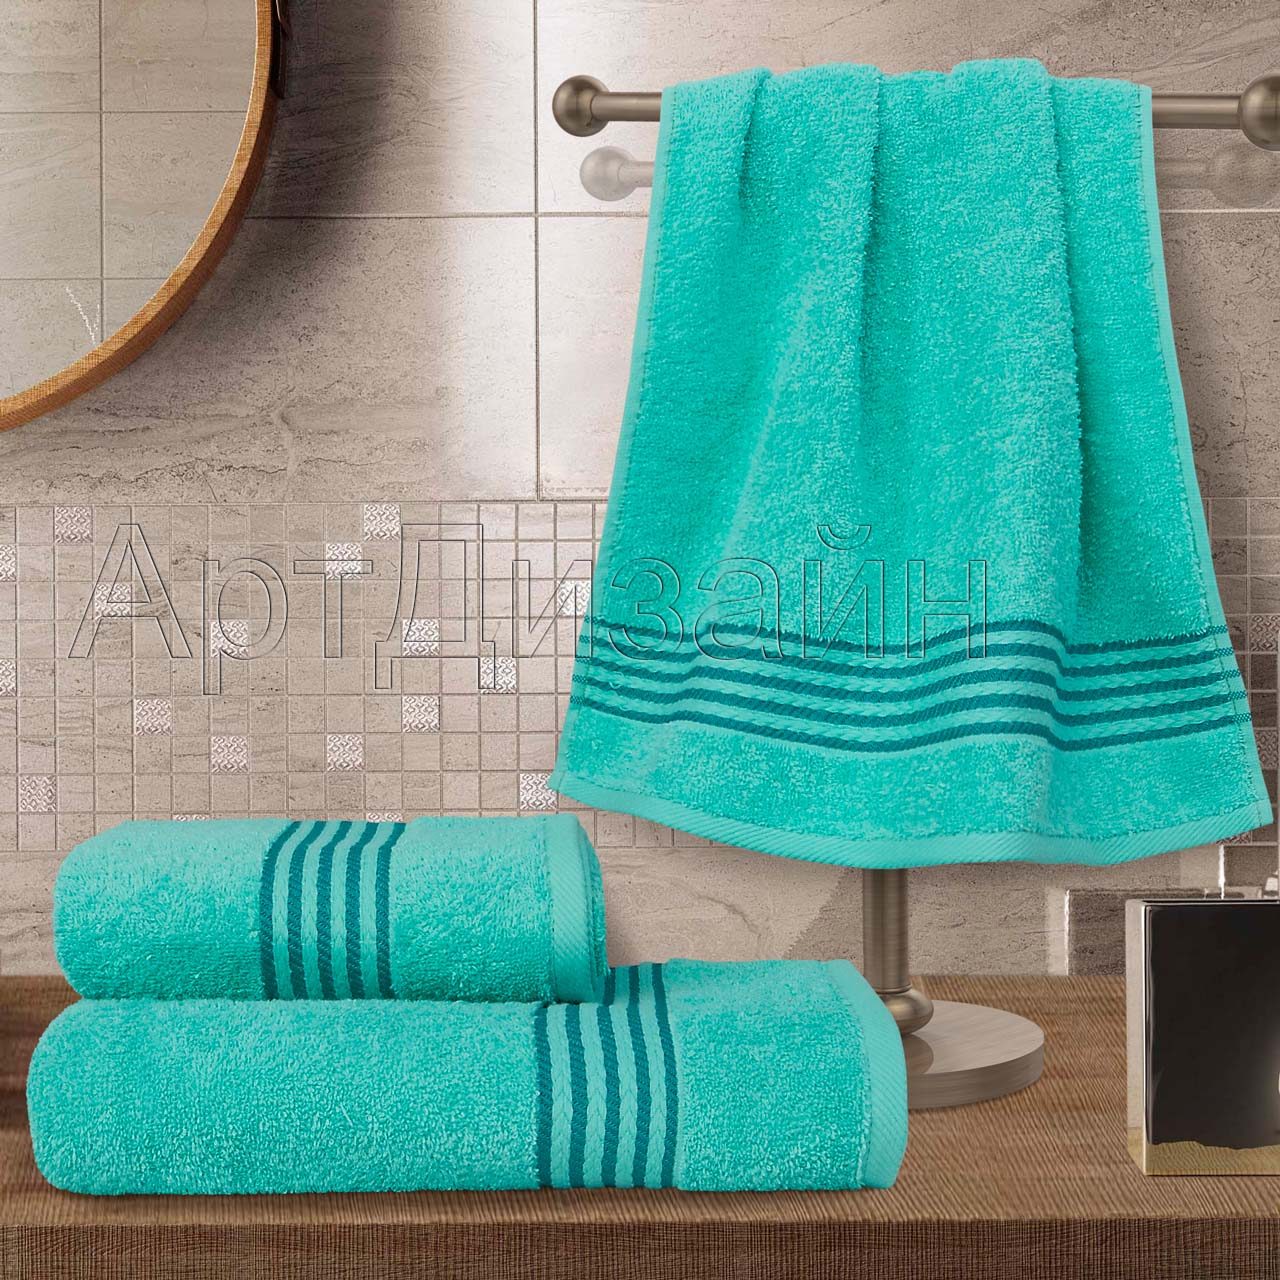 Полотенце Классик Аква р. 40х70Махровые полотенца<br>Плотность: 400 г/кв. м<br><br>Тип: Полотенце<br>Размер: 40х70<br>Материал: Махра